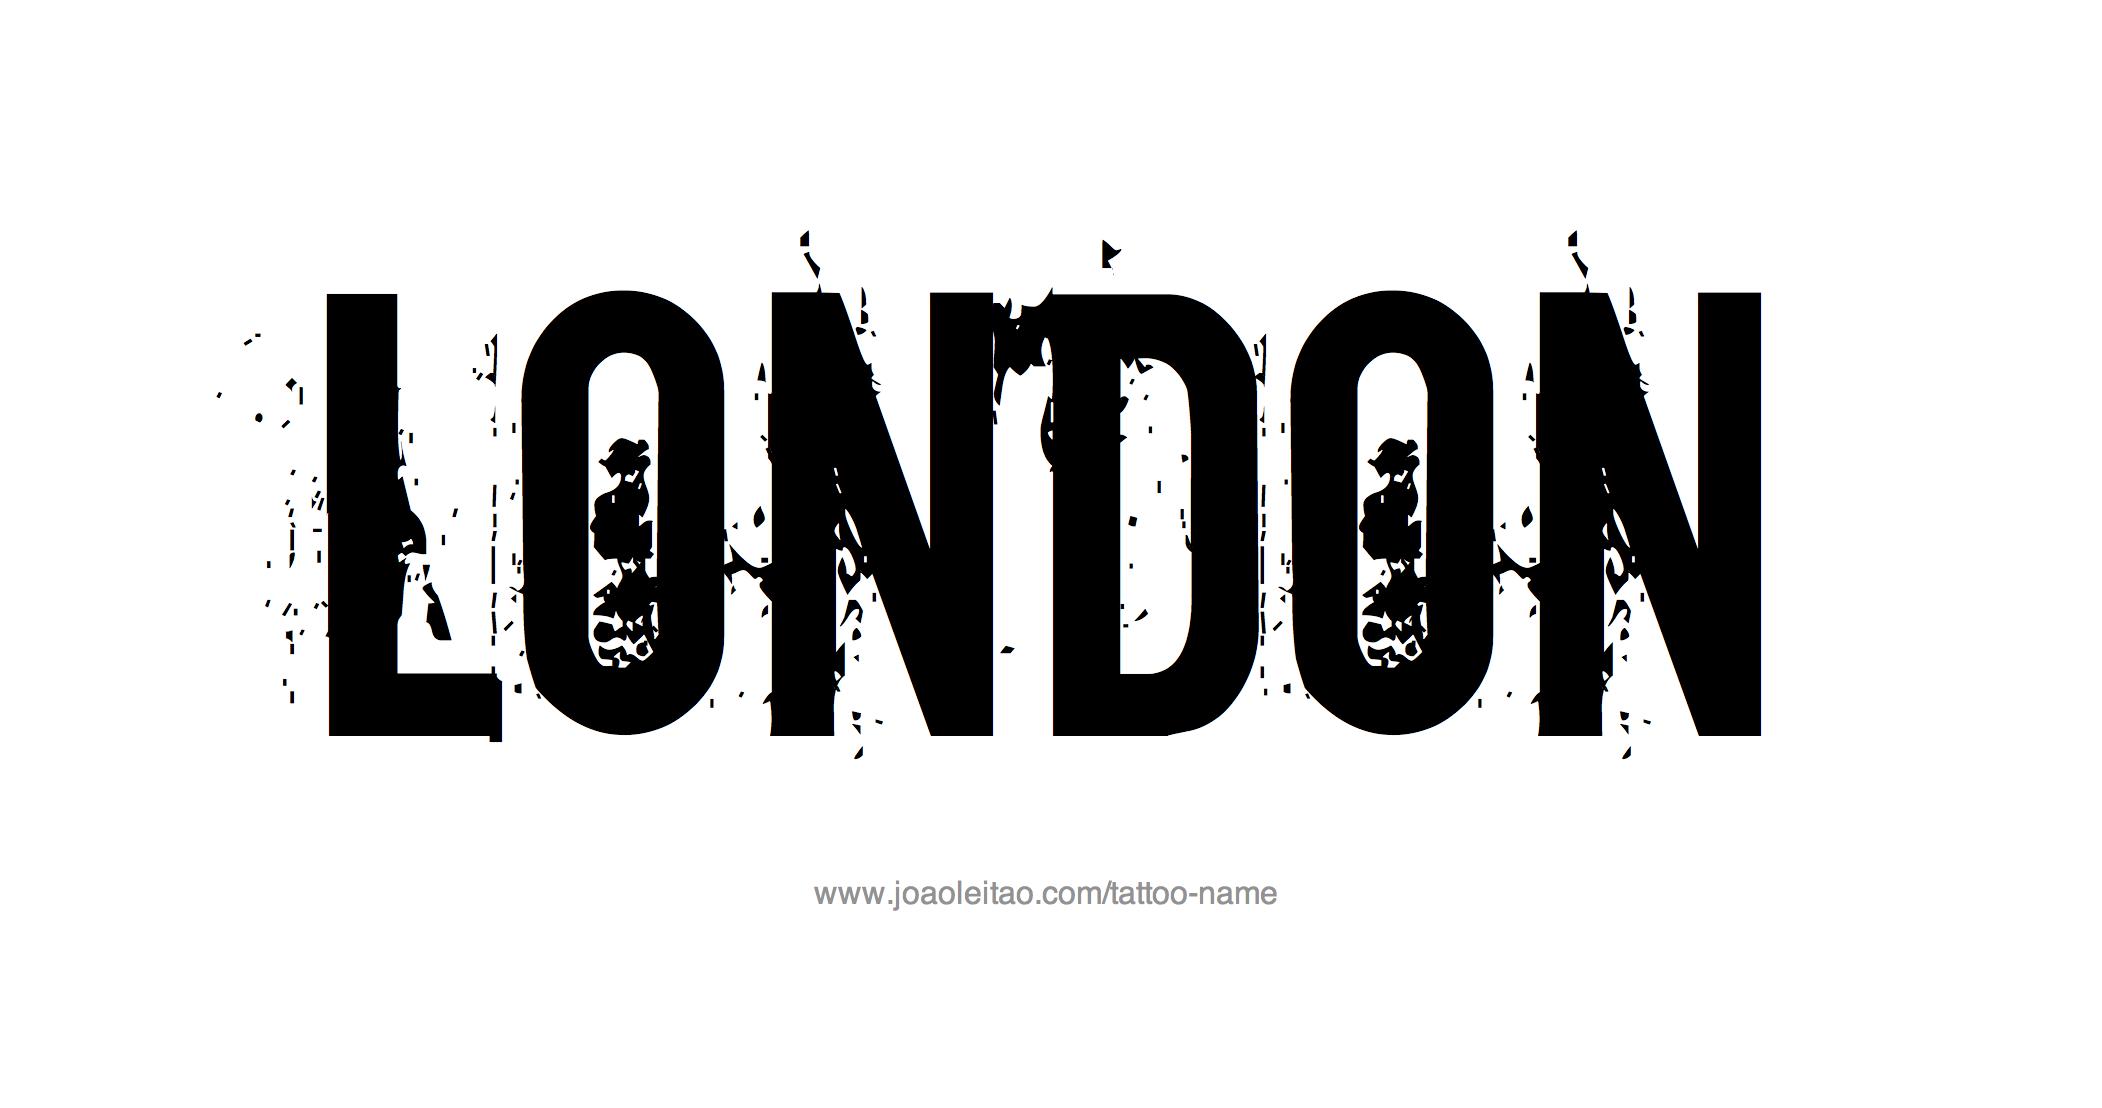 Tattoo Design Name London